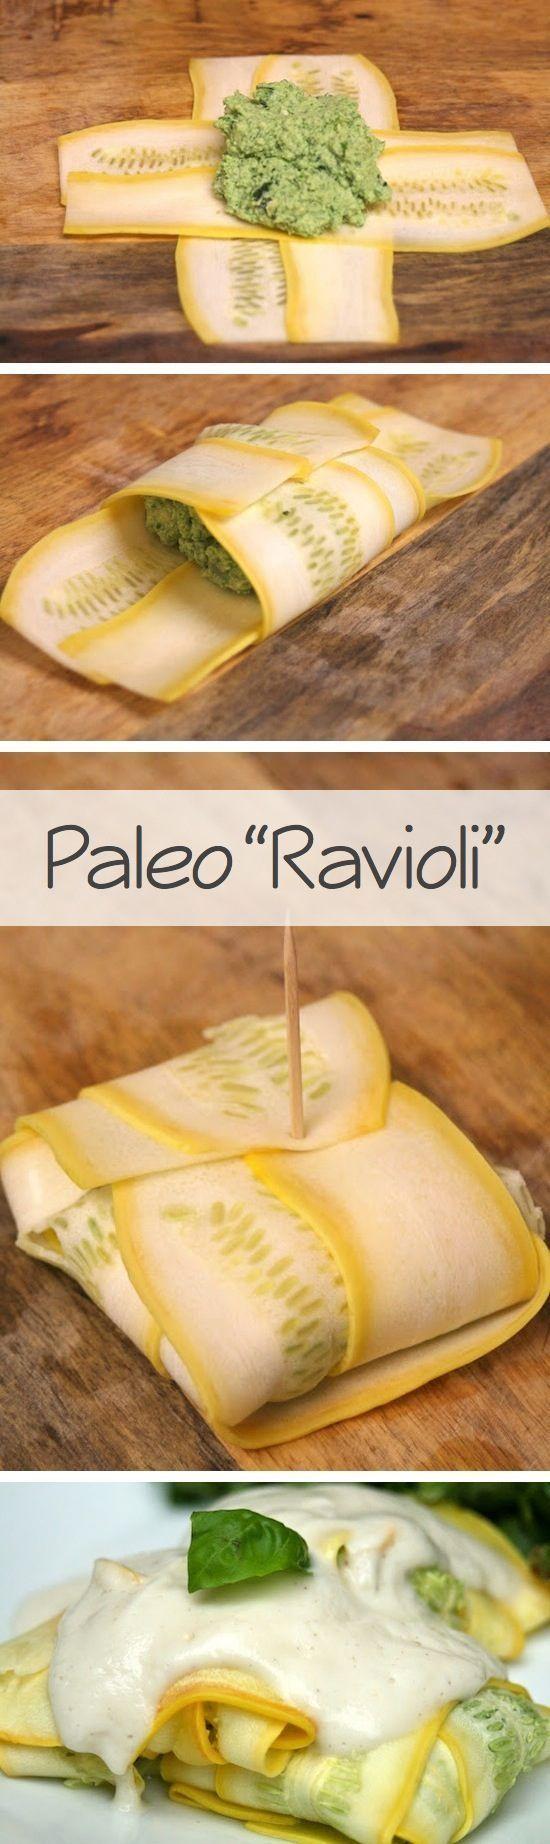 "Healthy Recipe | Paleo ""Ravioli"""